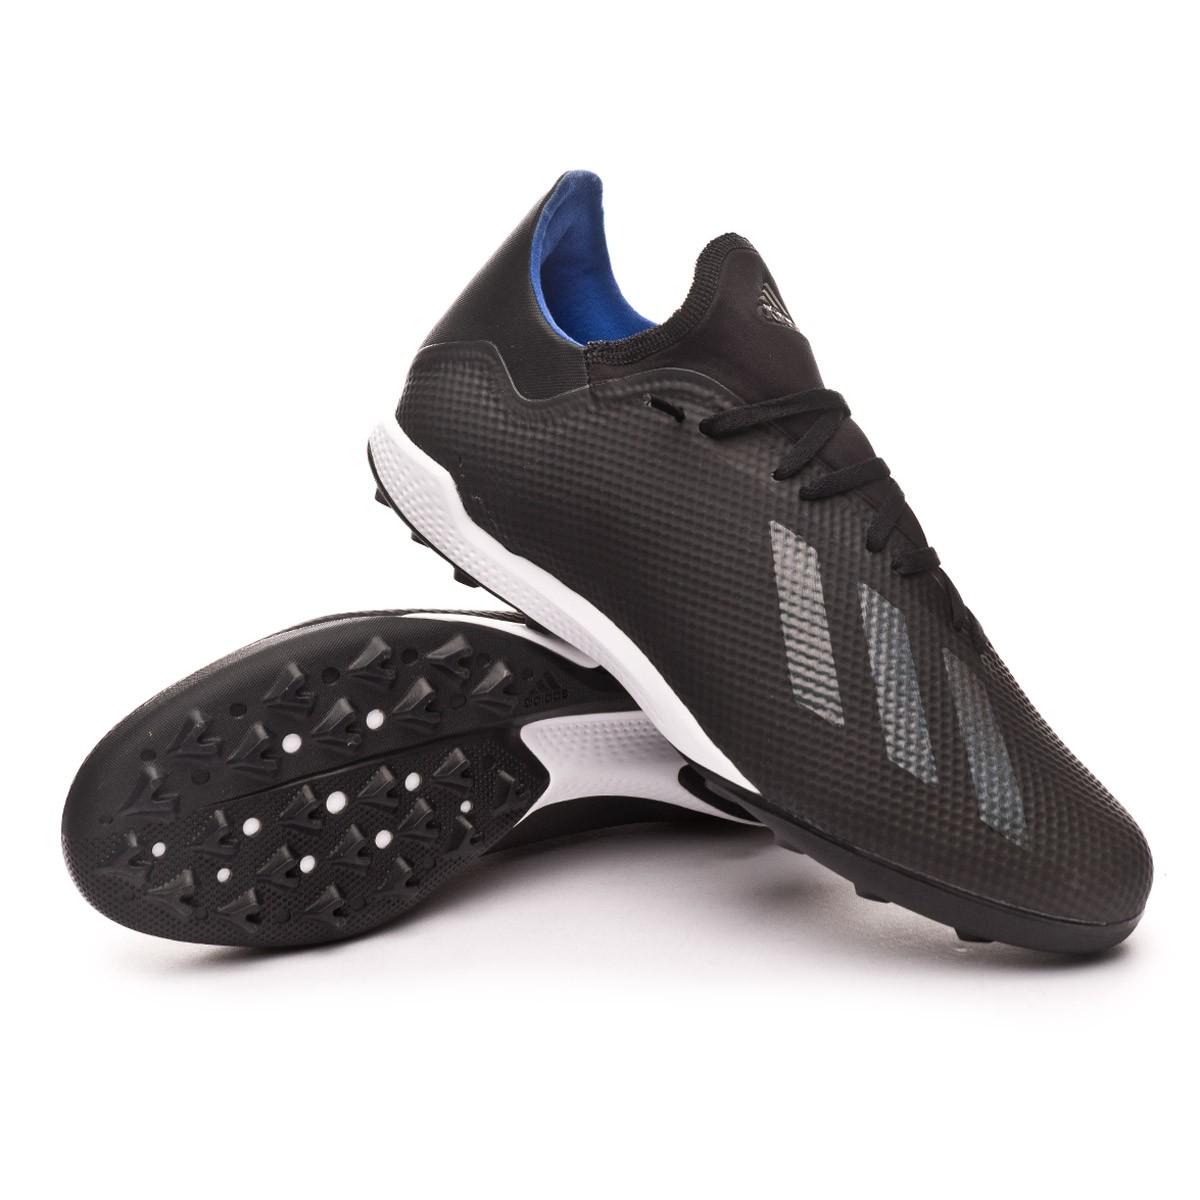 6b0271553 Scarpe adidas X Tango 18.3 Turf Core black-Bold blue - Negozio di calcio  Fútbol Emotion